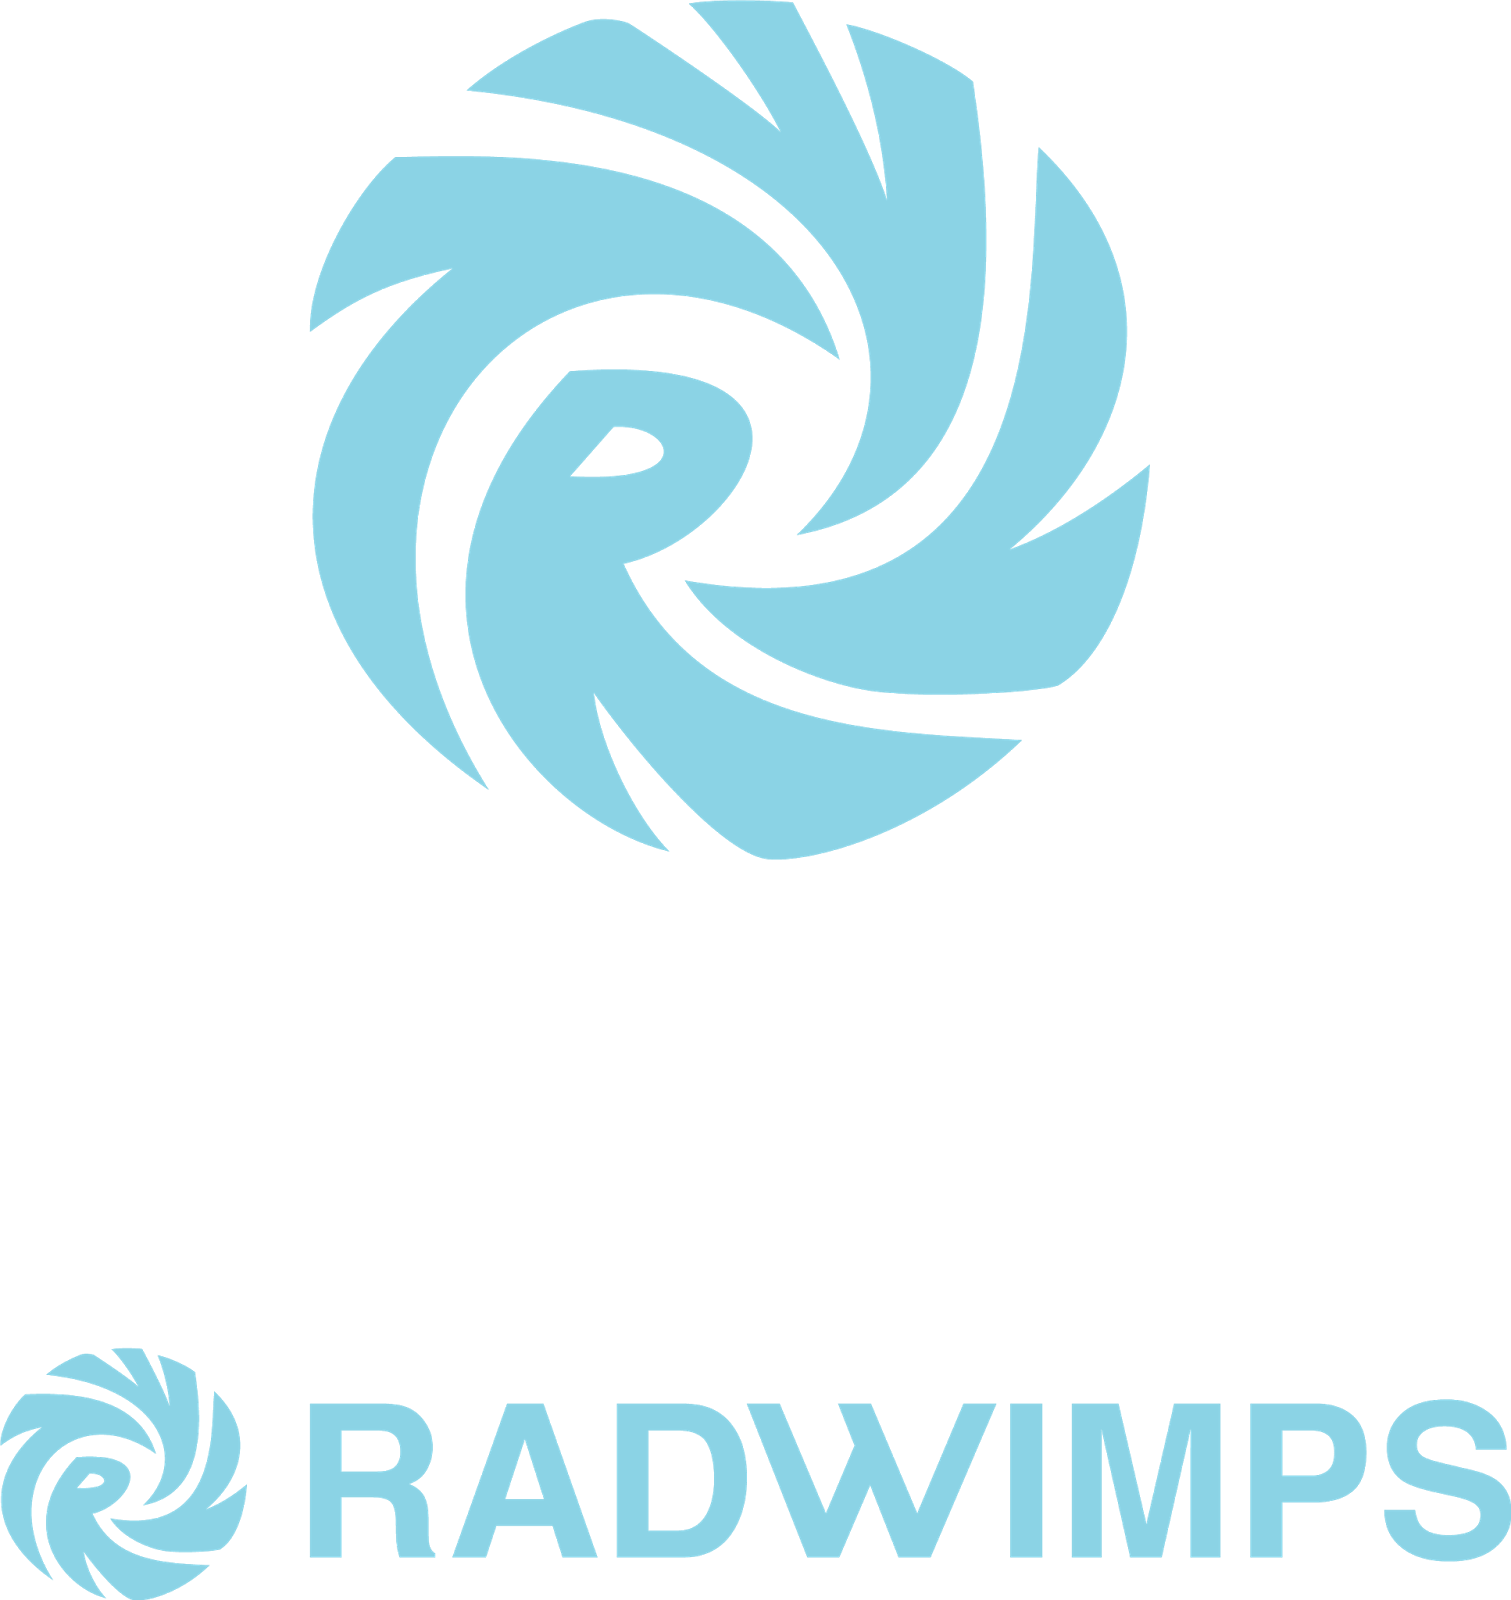 RADWIMPSの白背景透過ロゴ